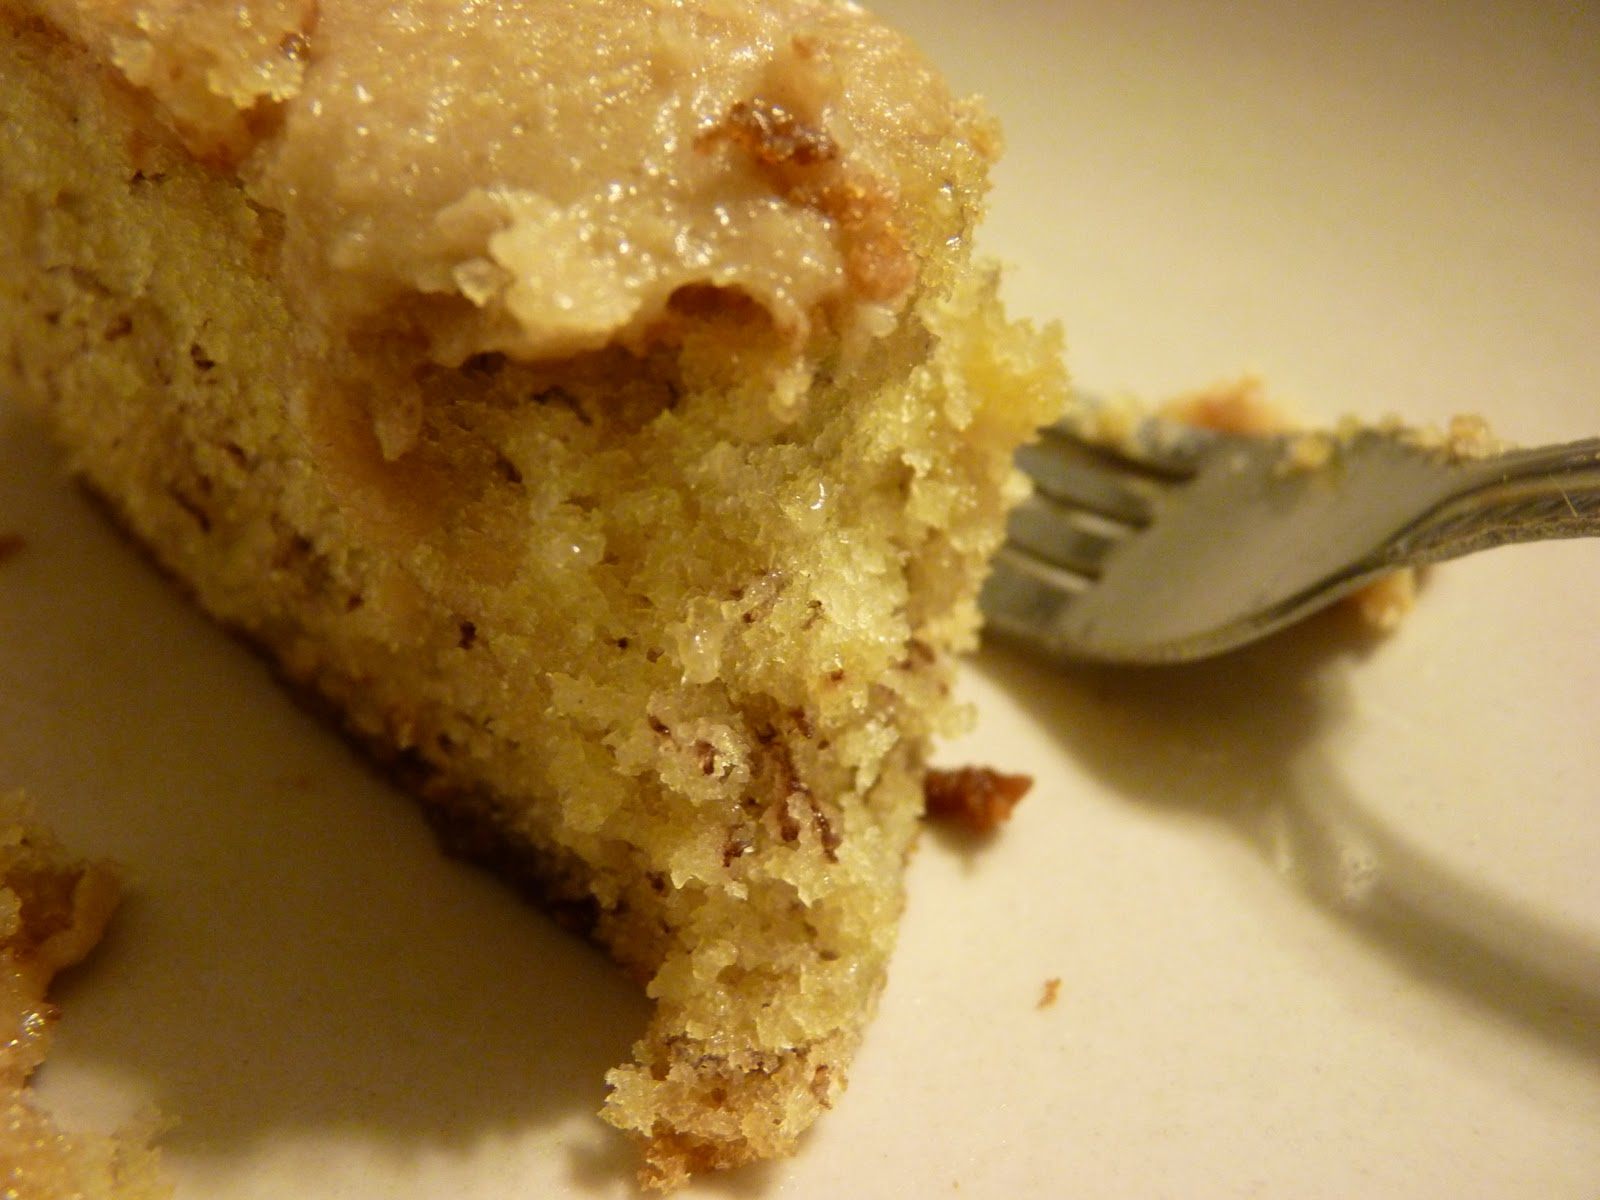 amelia.mary: Grandma's Banana Cake with Caramel Frosting